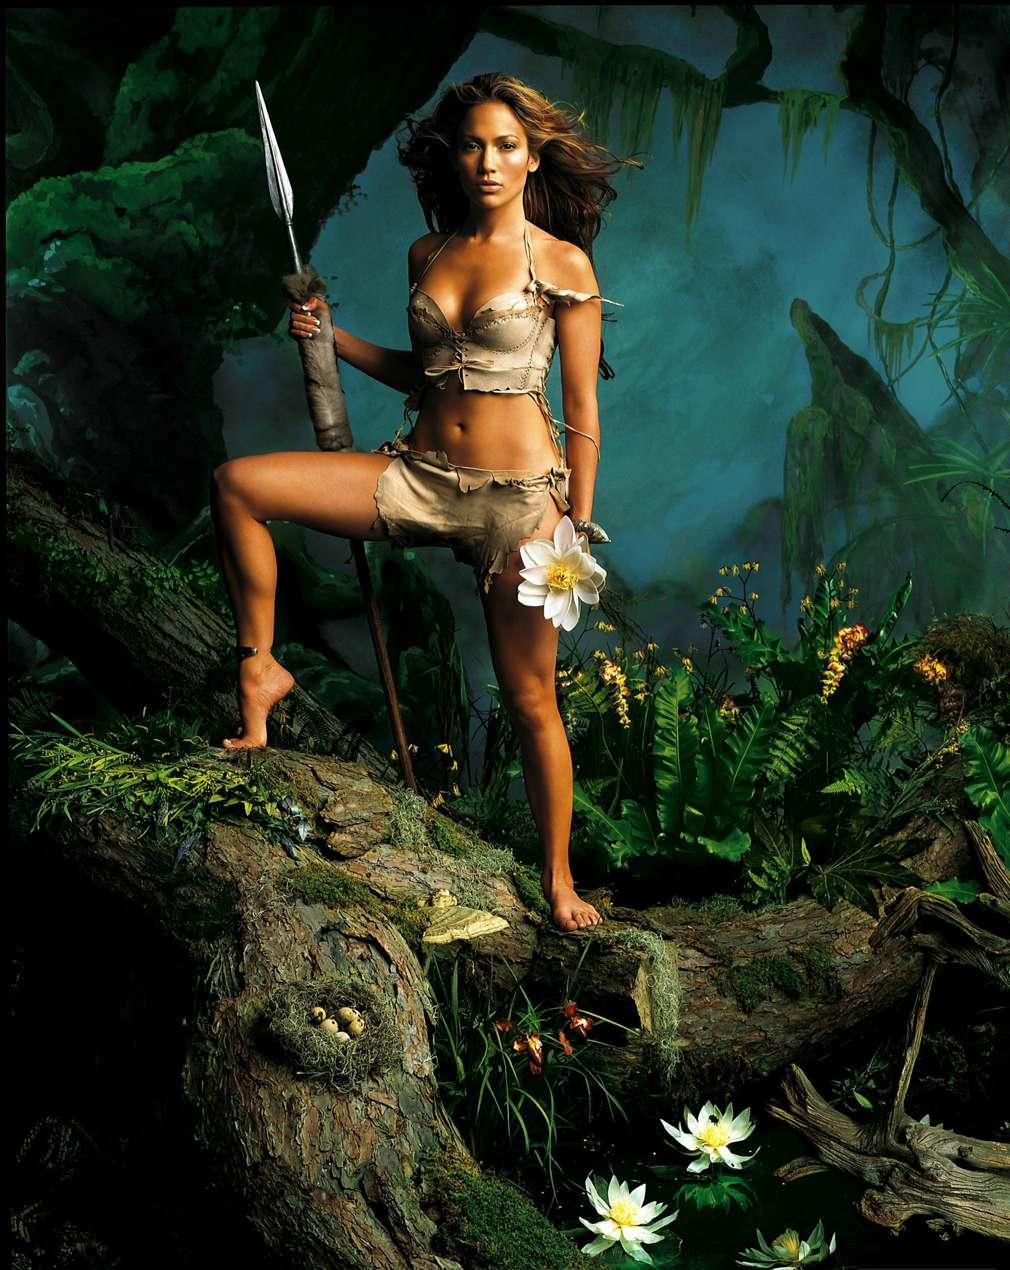 Naked amazon warrior women photos erotic pics